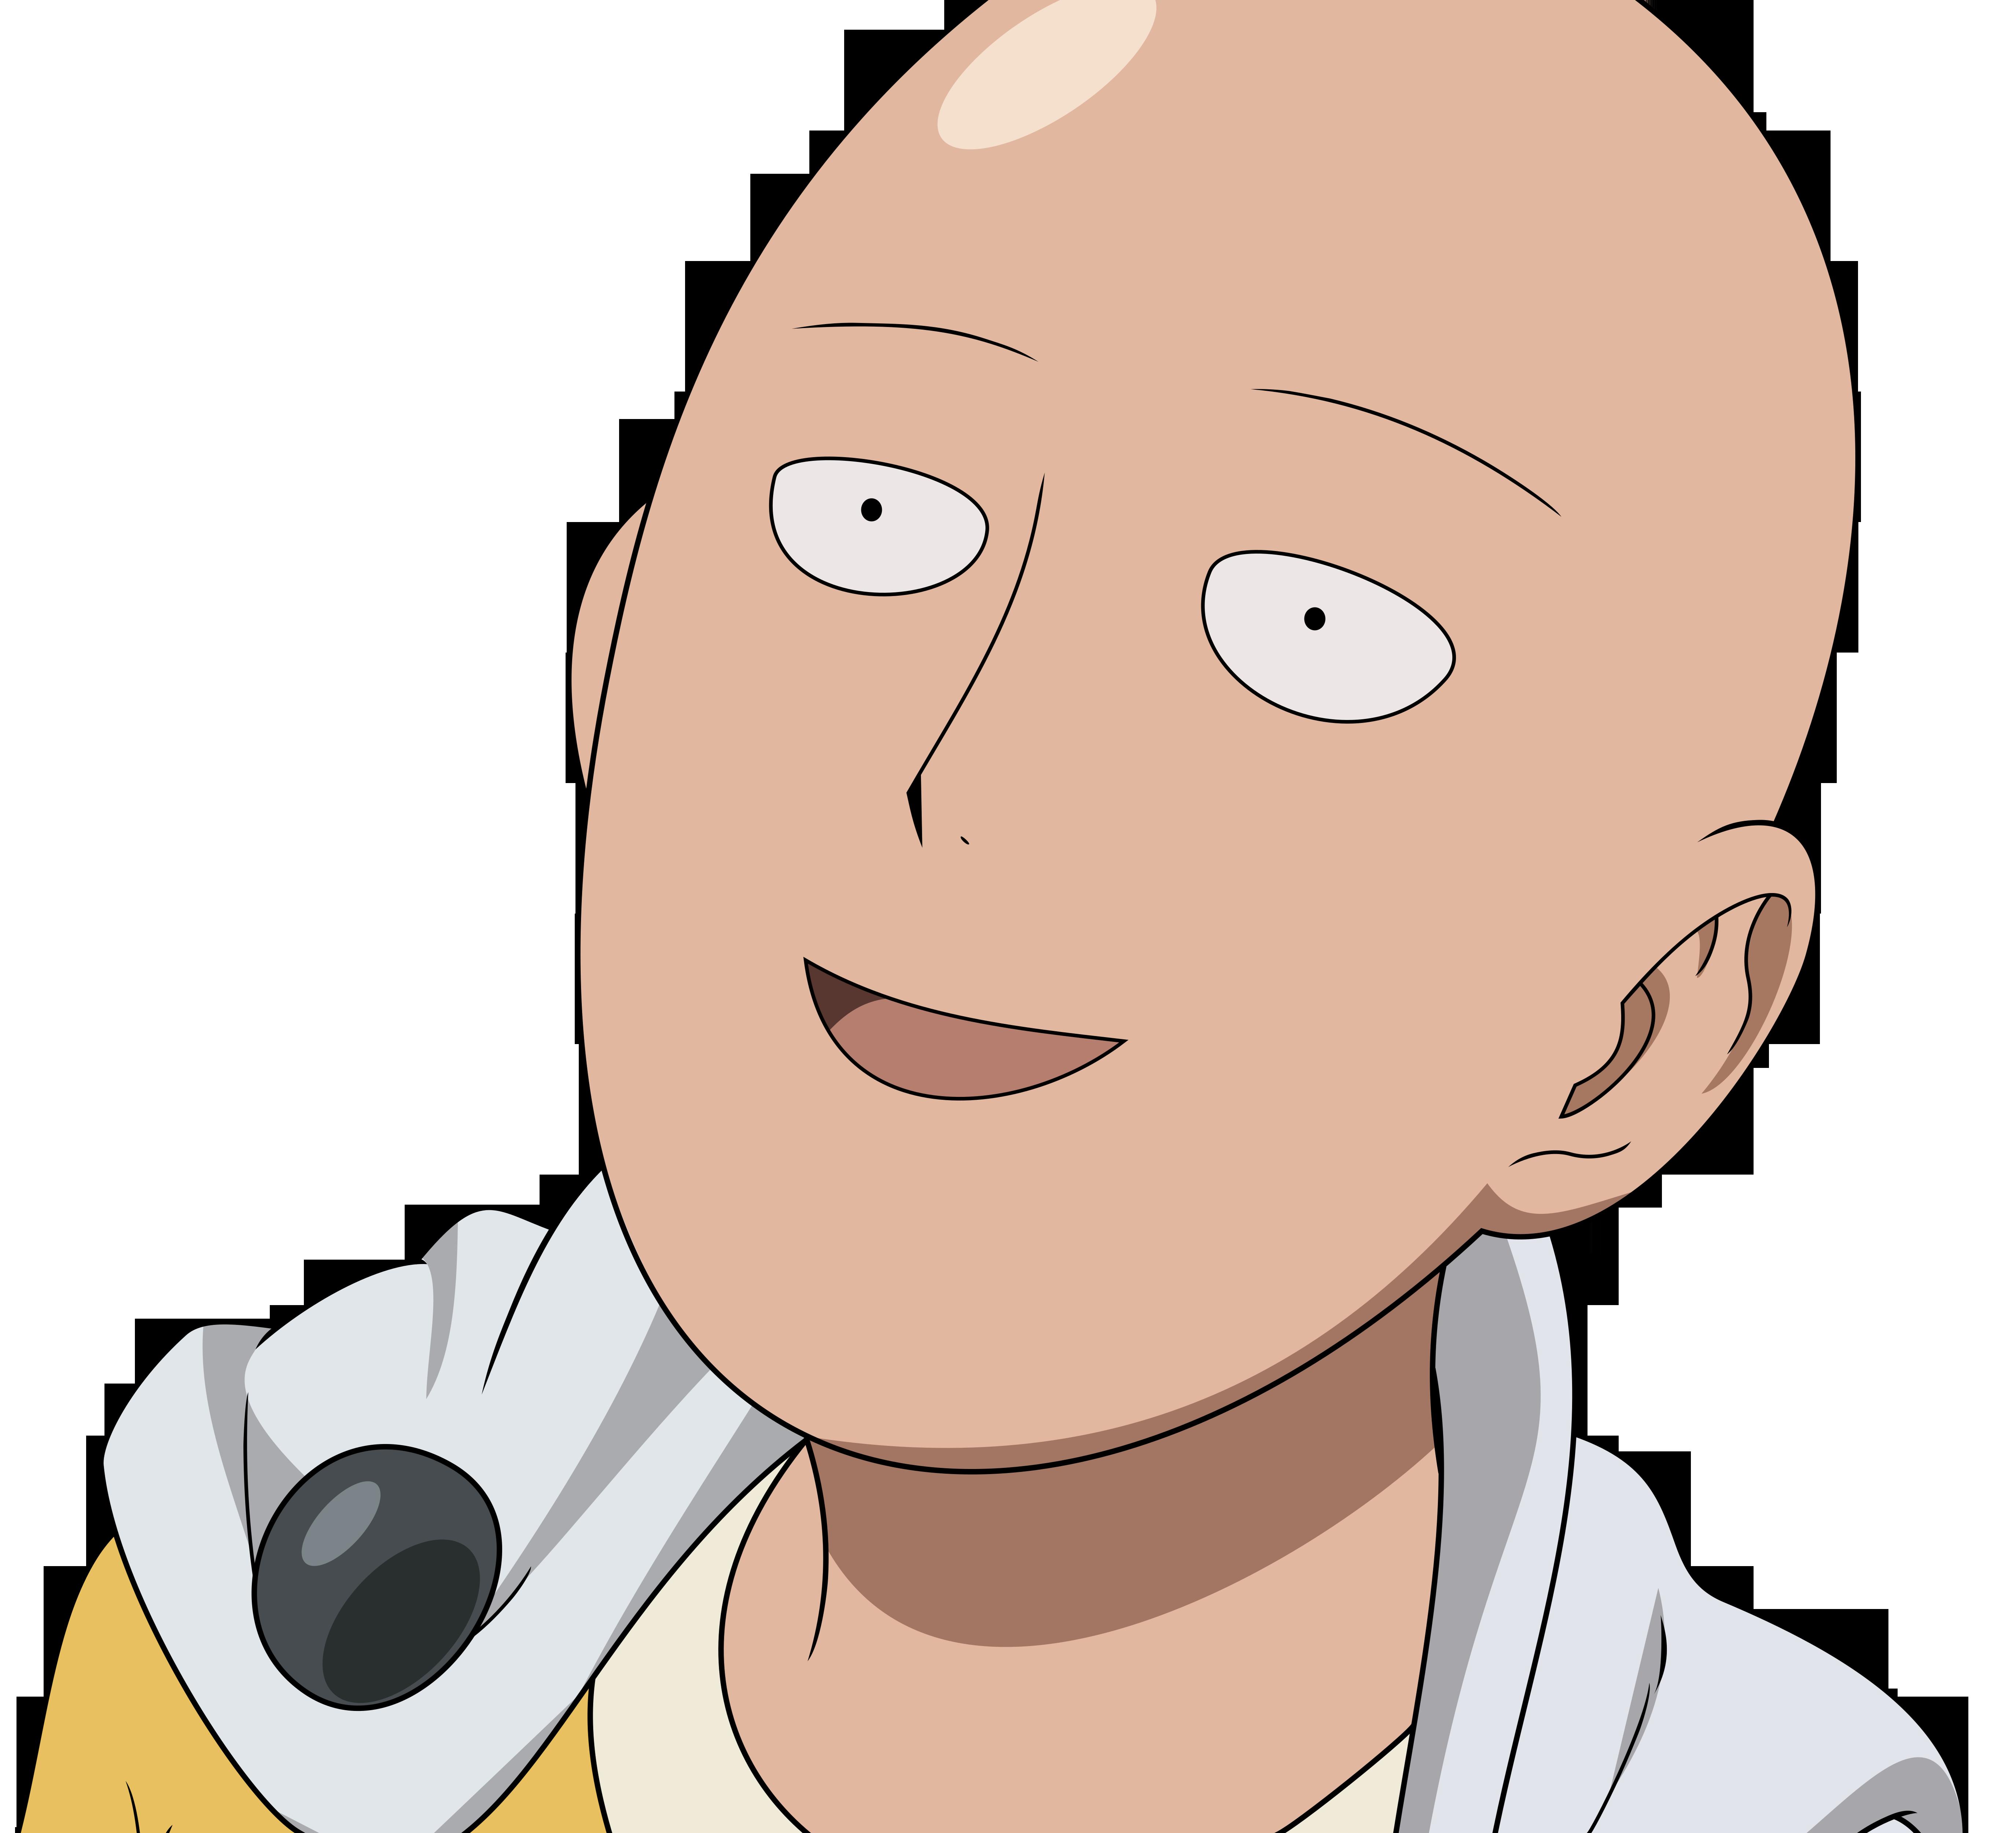 Anime 5500x5000 One-Punch Man anime Saitama